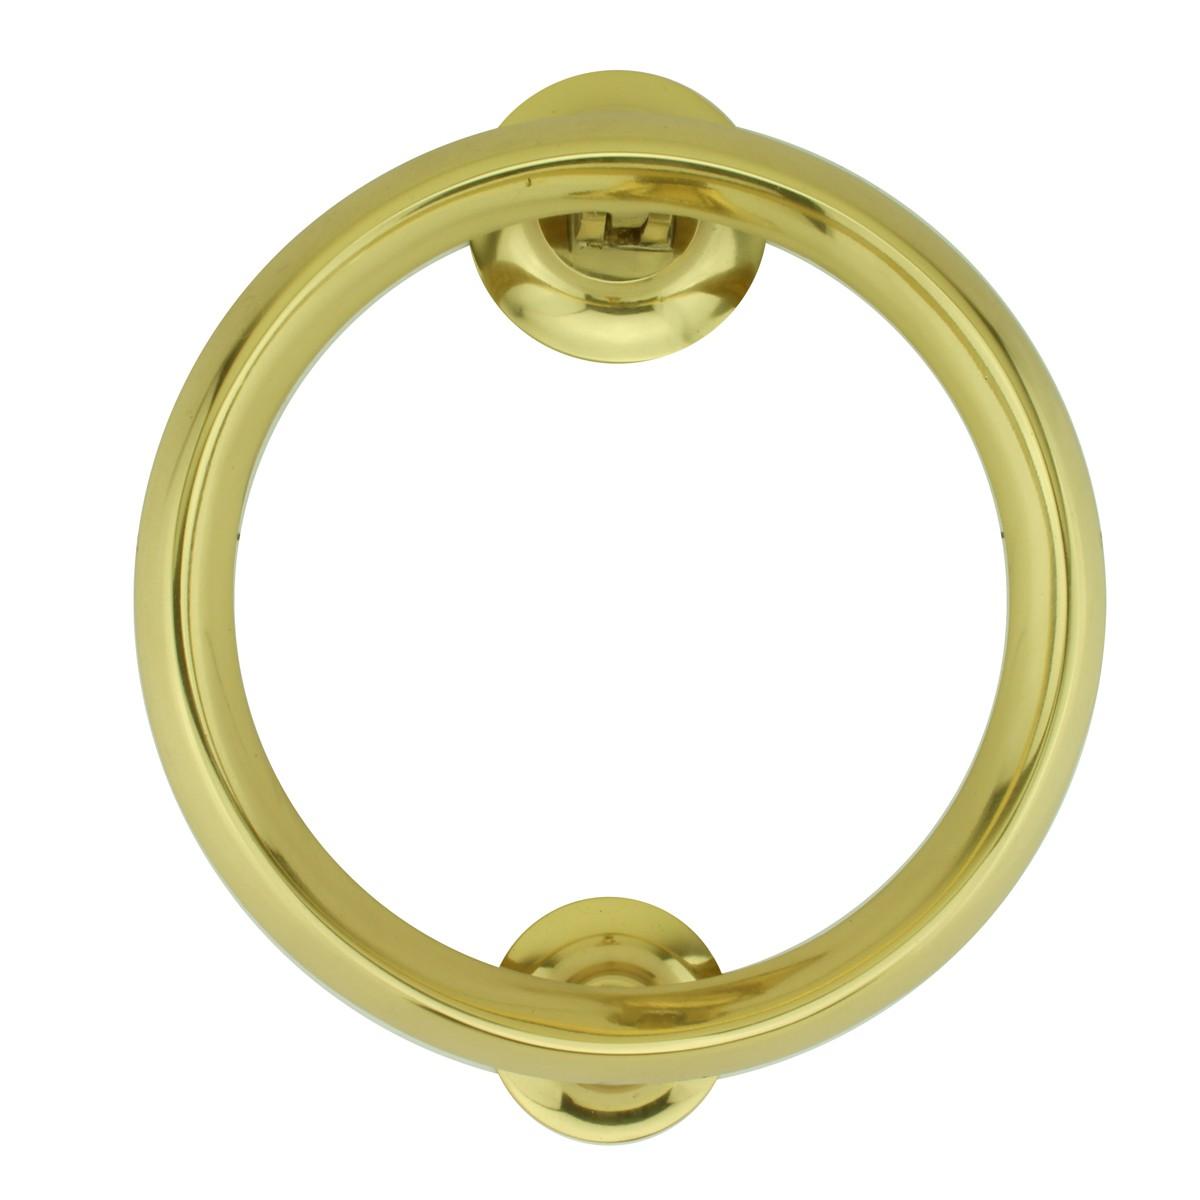 ... U003cPREu003eBeveled Circle Shaped Brass Ring Door Knocker 5 Inch ...